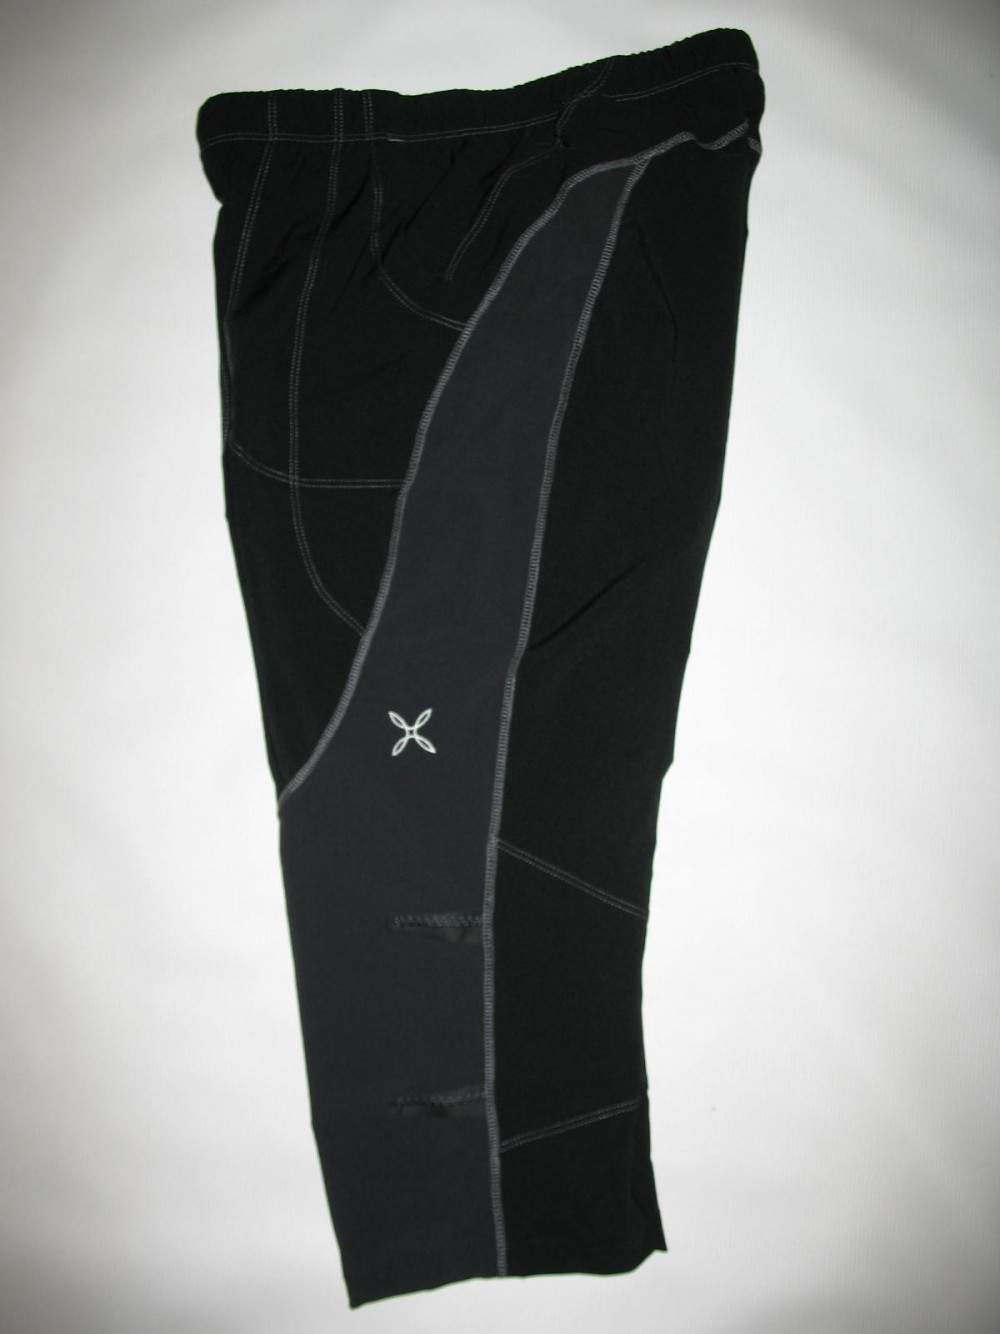 Шорты MONTURA free synt up 34 climbing shorts (размер M/S) - 3